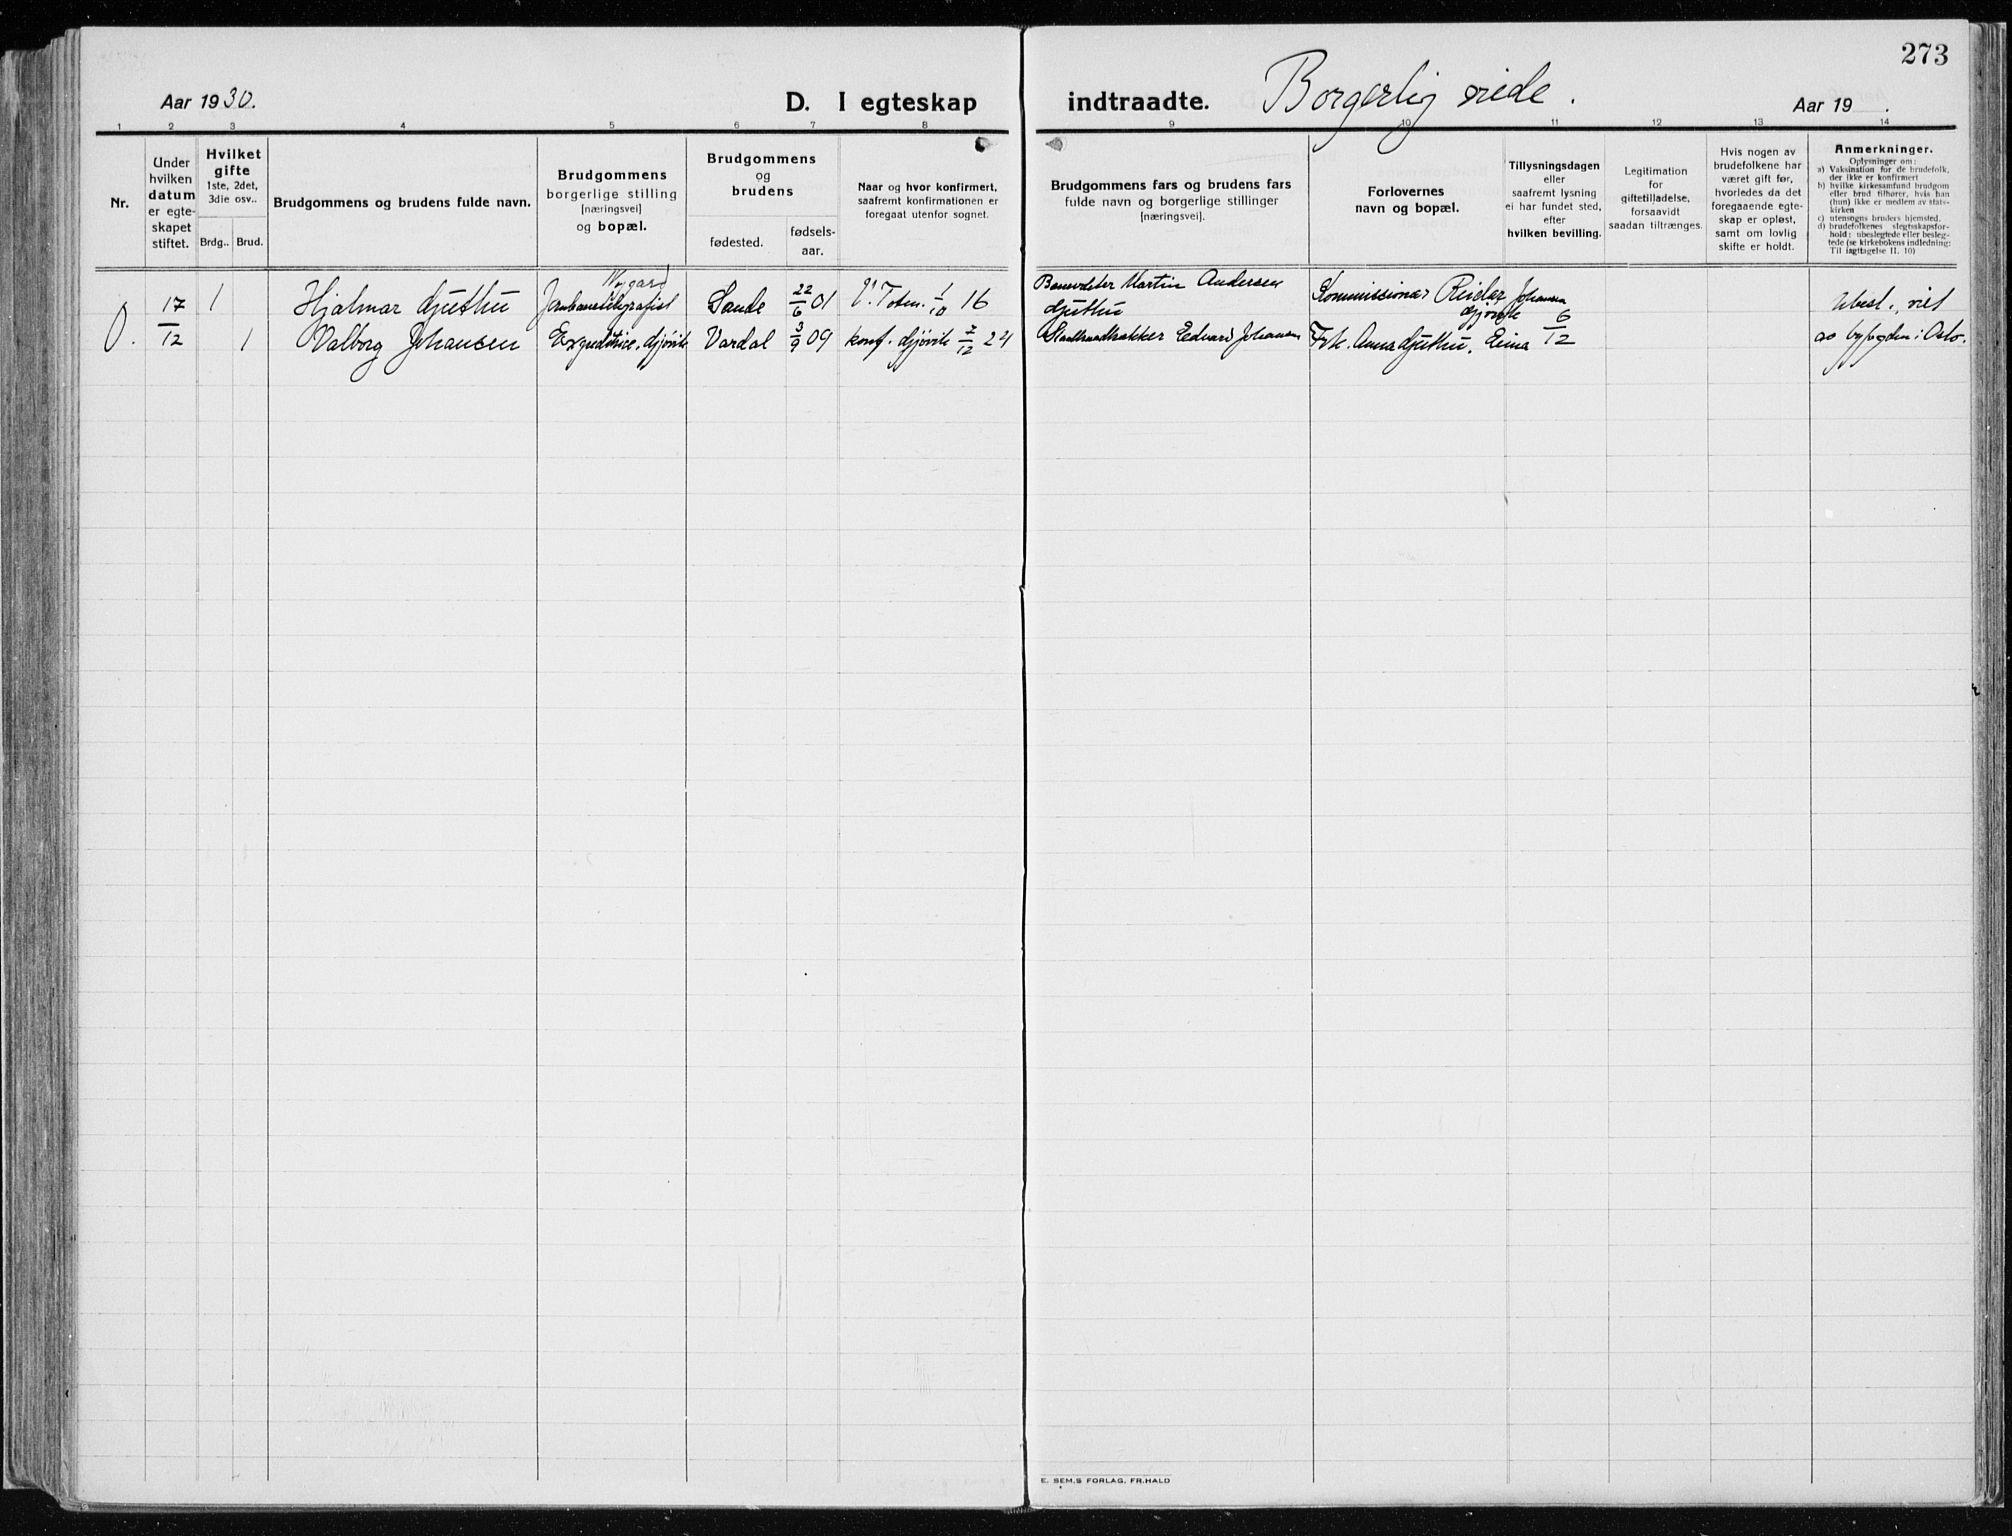 SAH, Vardal prestekontor, H/Ha/Haa/L0015: Ministerialbok nr. 15, 1923-1937, s. 273